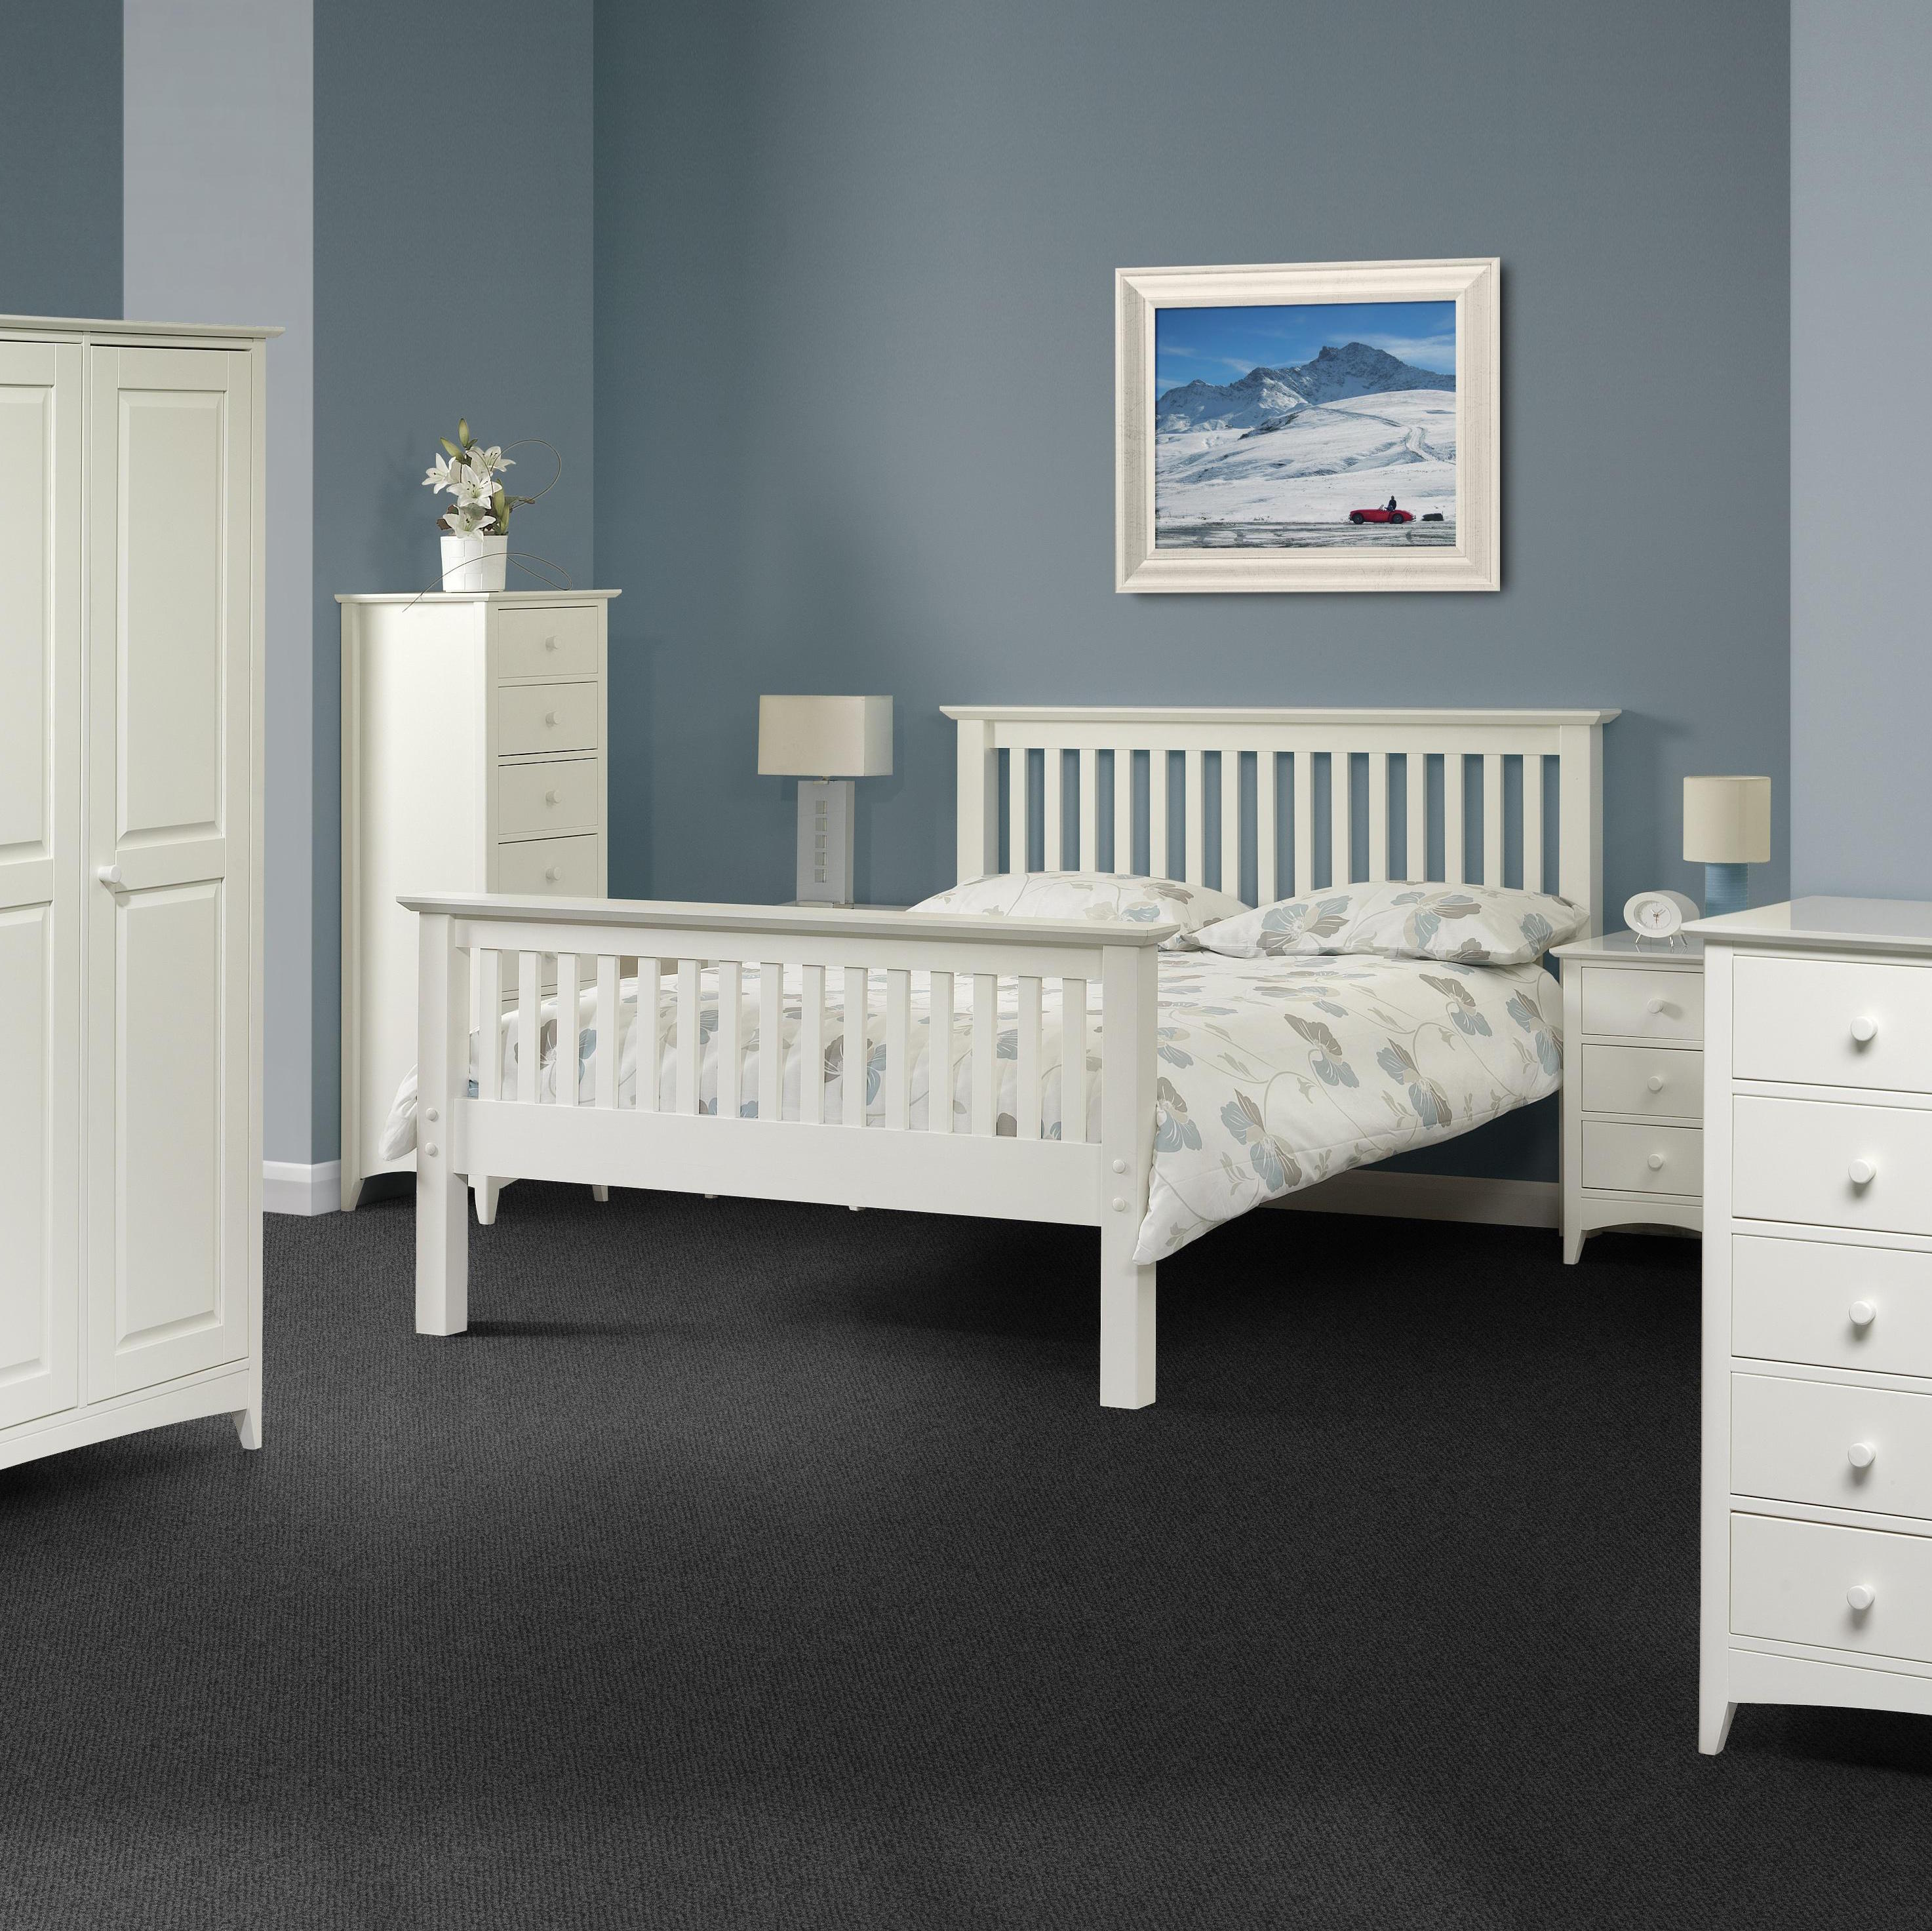 Cameo Bedroom Furniture